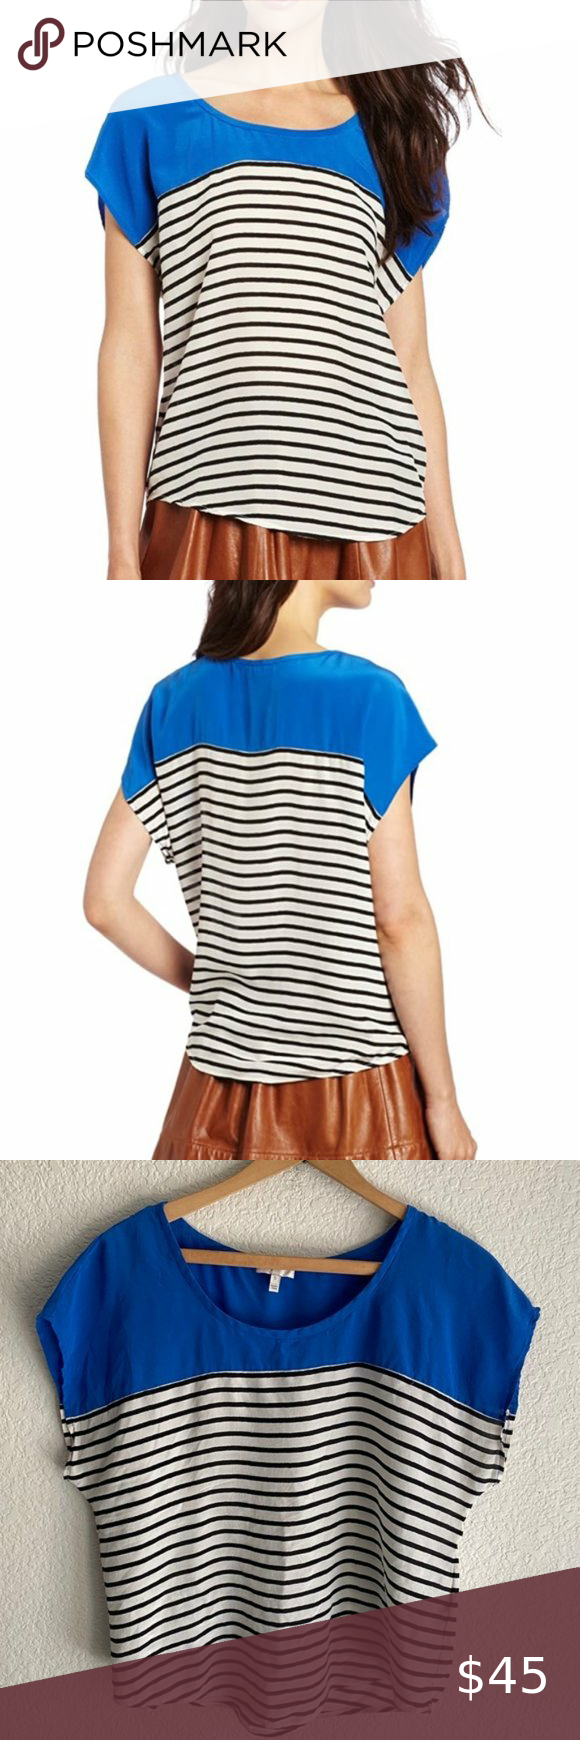 Joie 100 Silk Colorblock Blue White Striped Top Striped Top White Stripes Top Striped